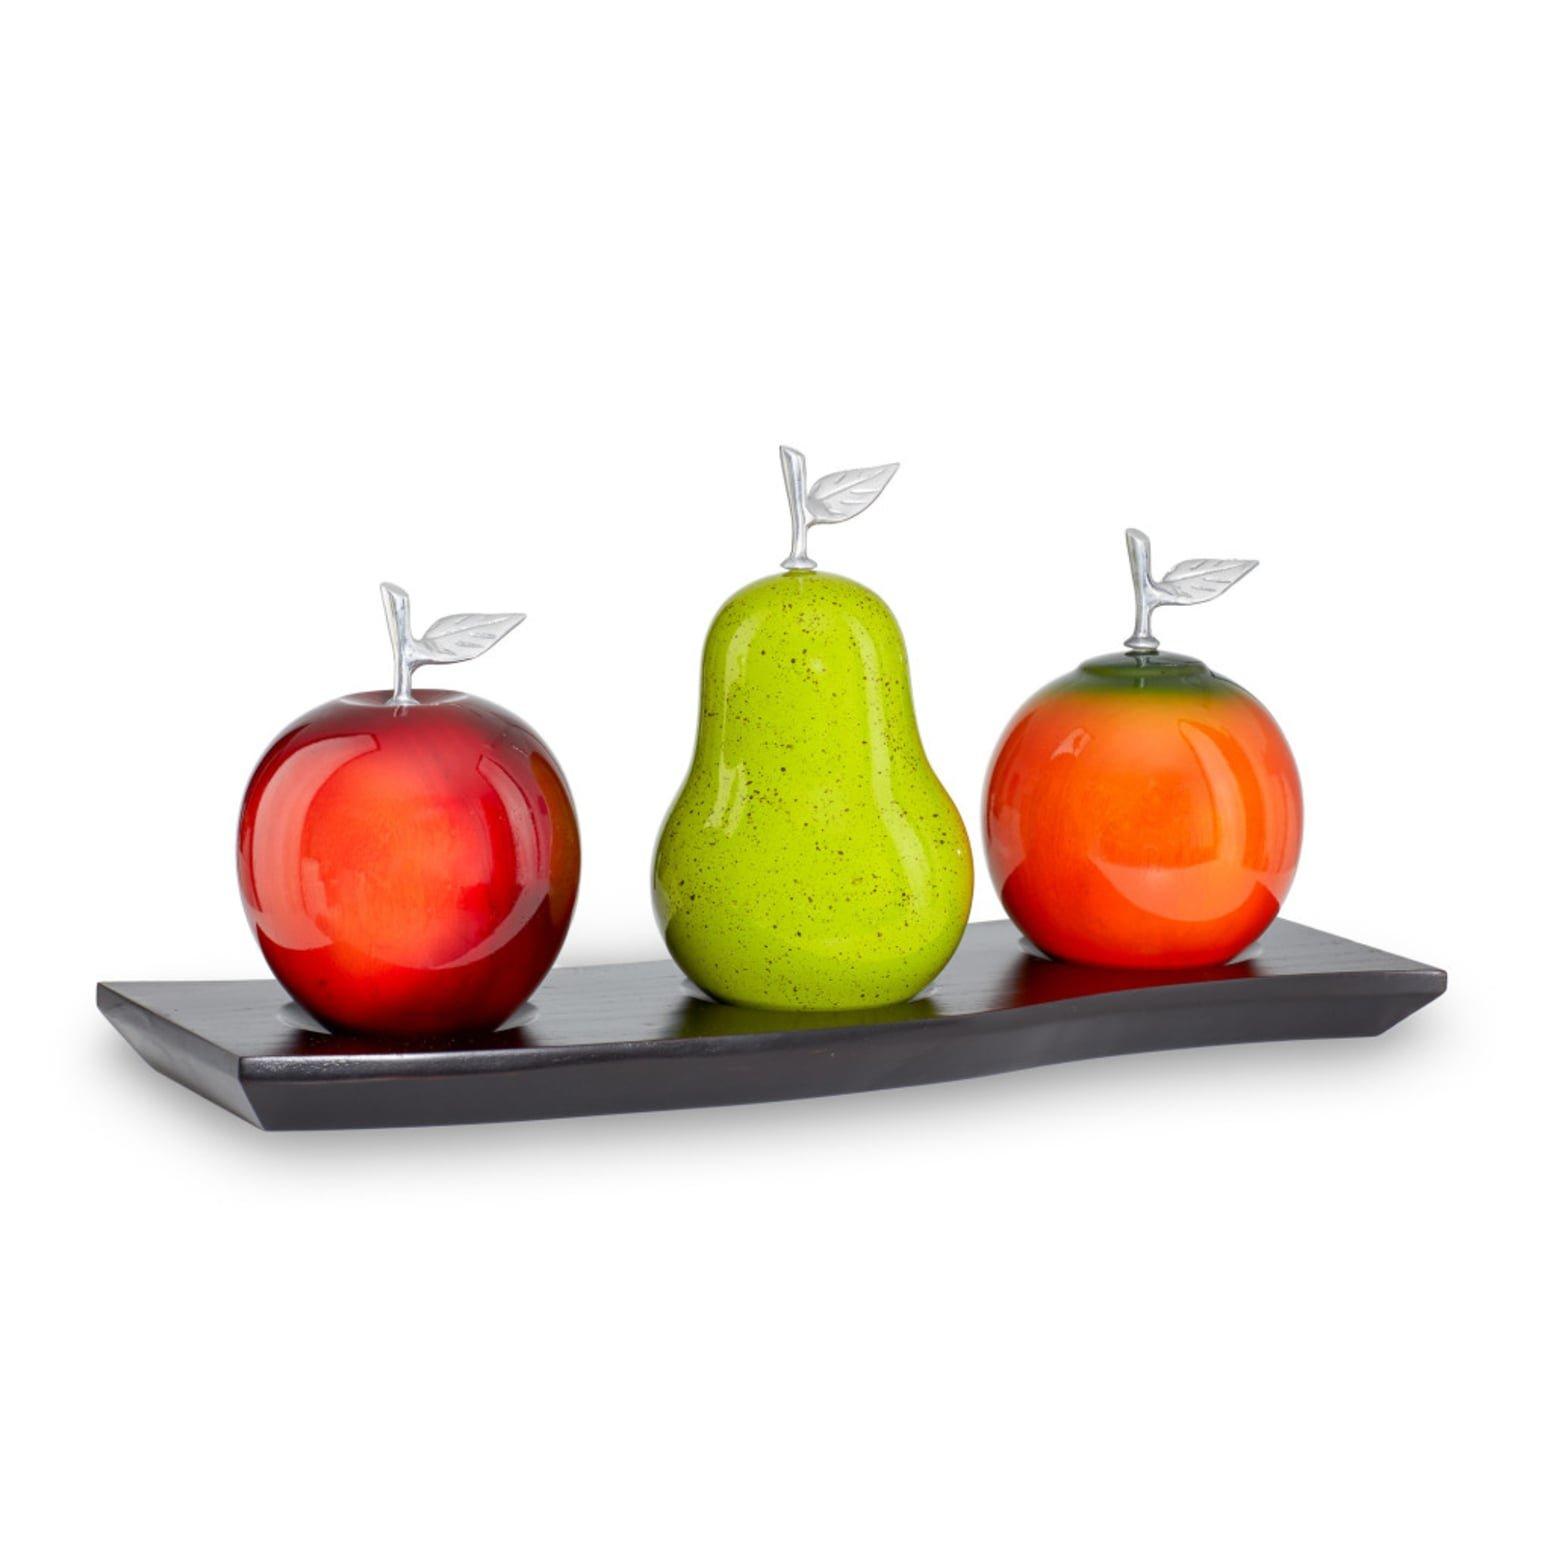 Artesana Home DW Apple Red, Pear Green, Orange Medium on a Triple Base Fruit Figurines by Artesana Home